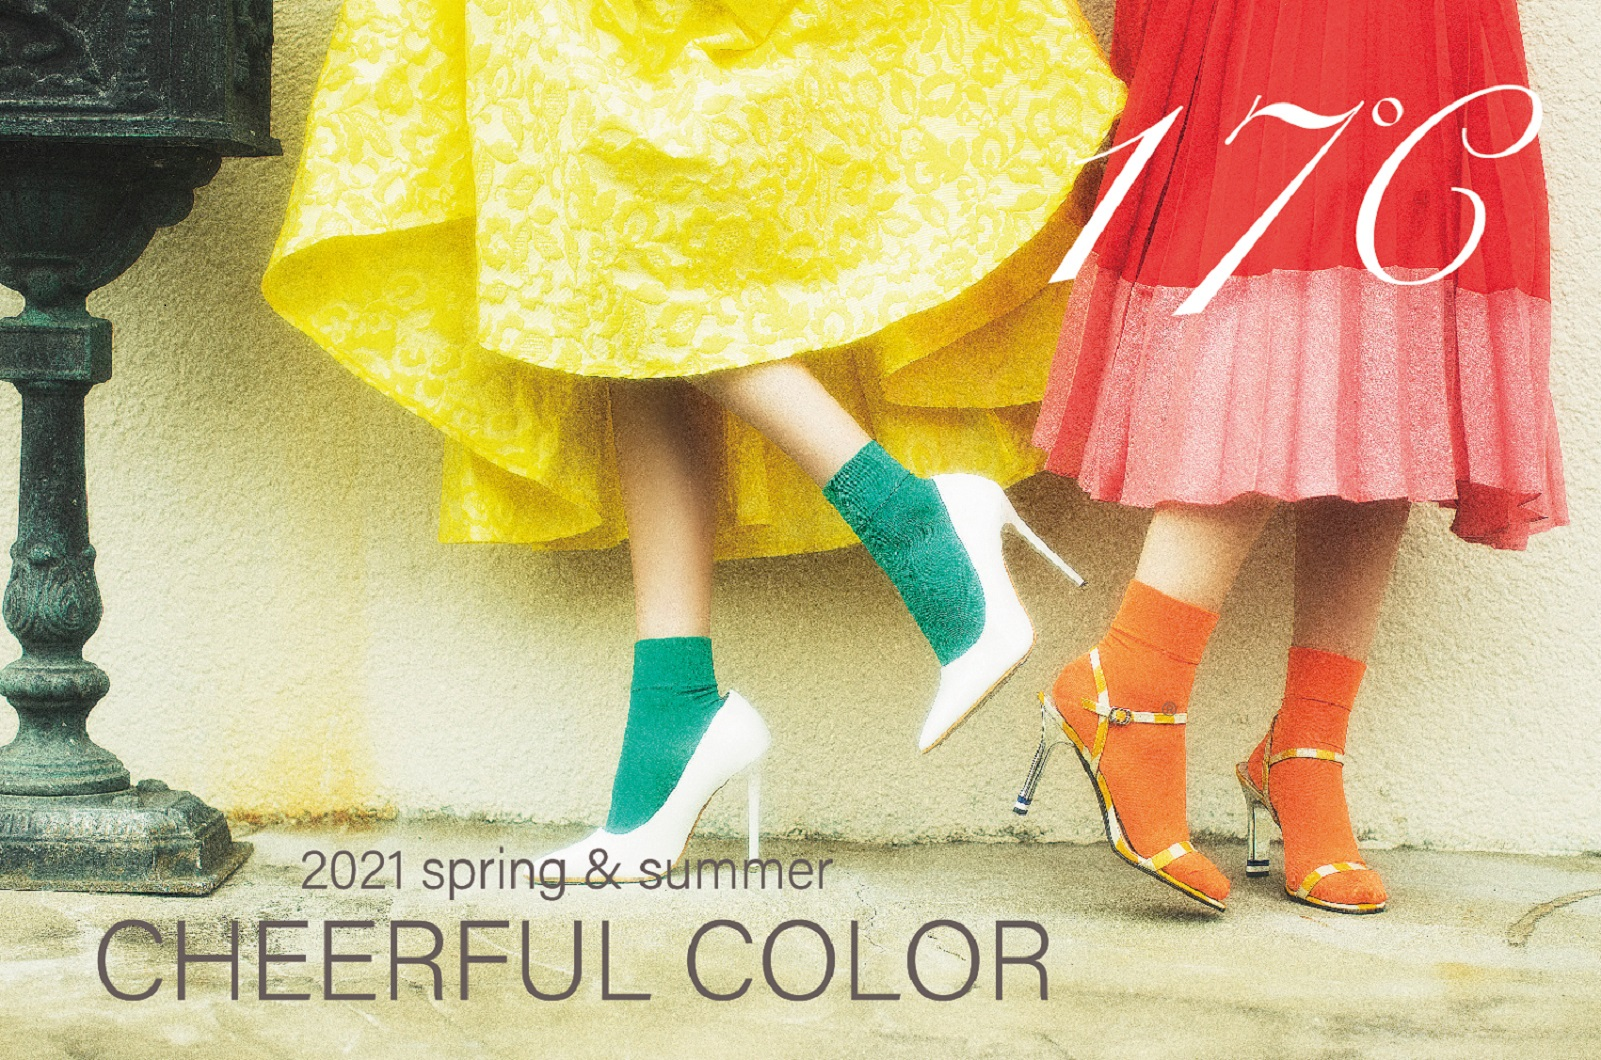 Cheerful Color チアフルカラー イメージ画像